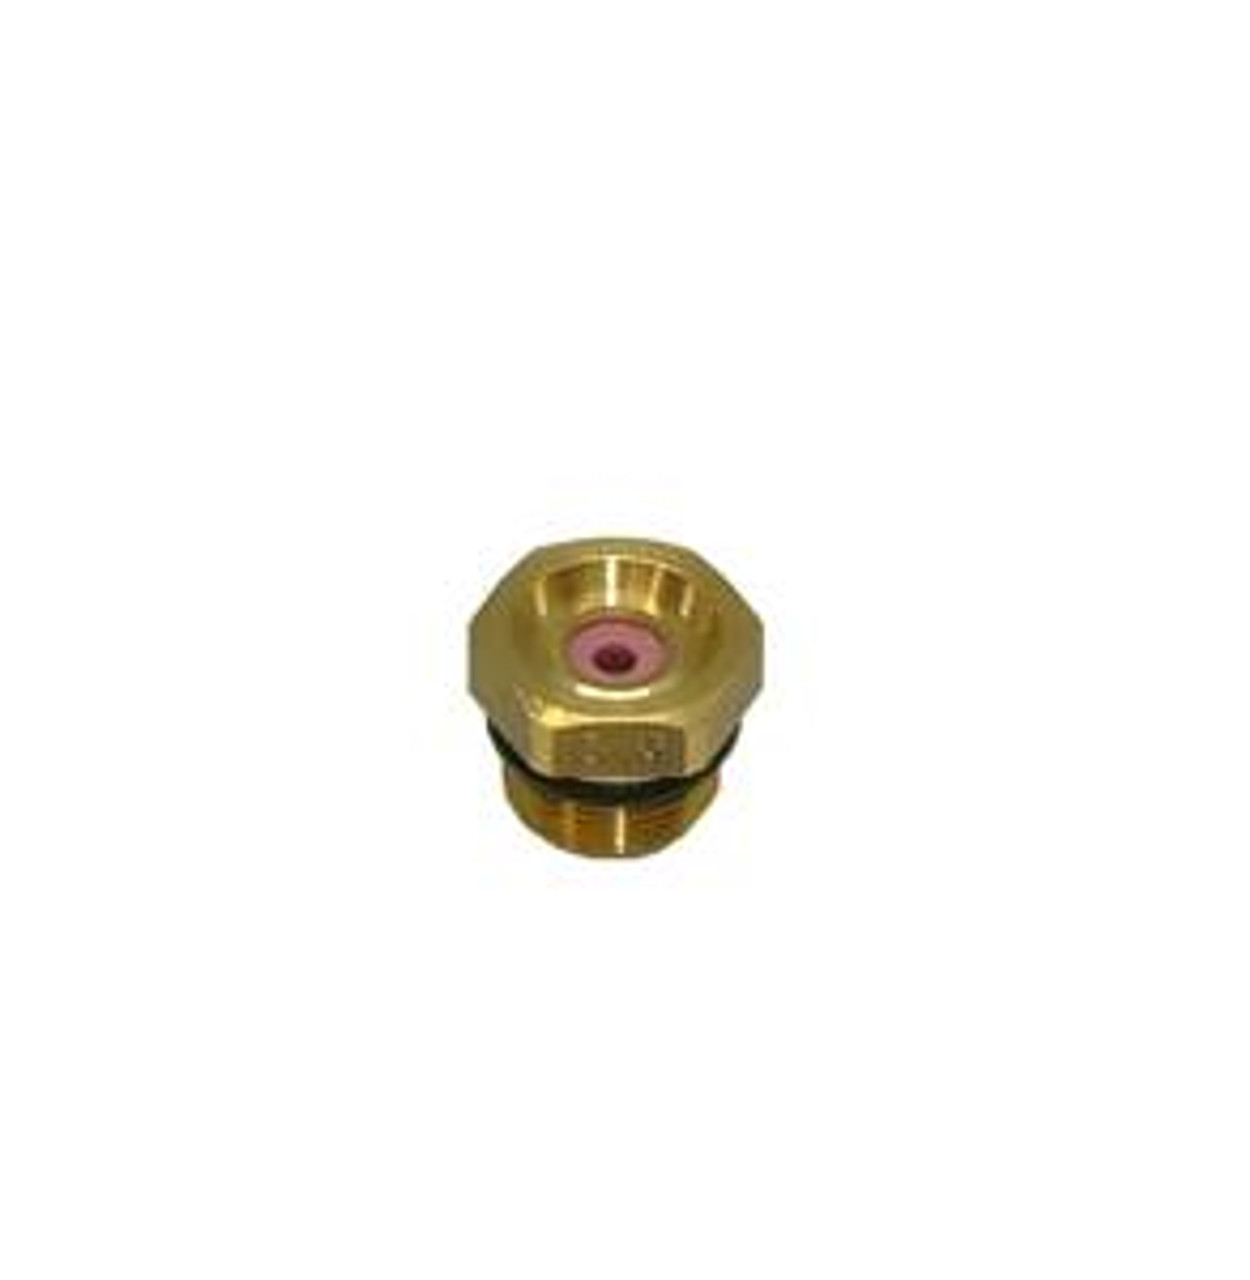 Nozzle for Turbo 400 gun - 3.5mm ceramic